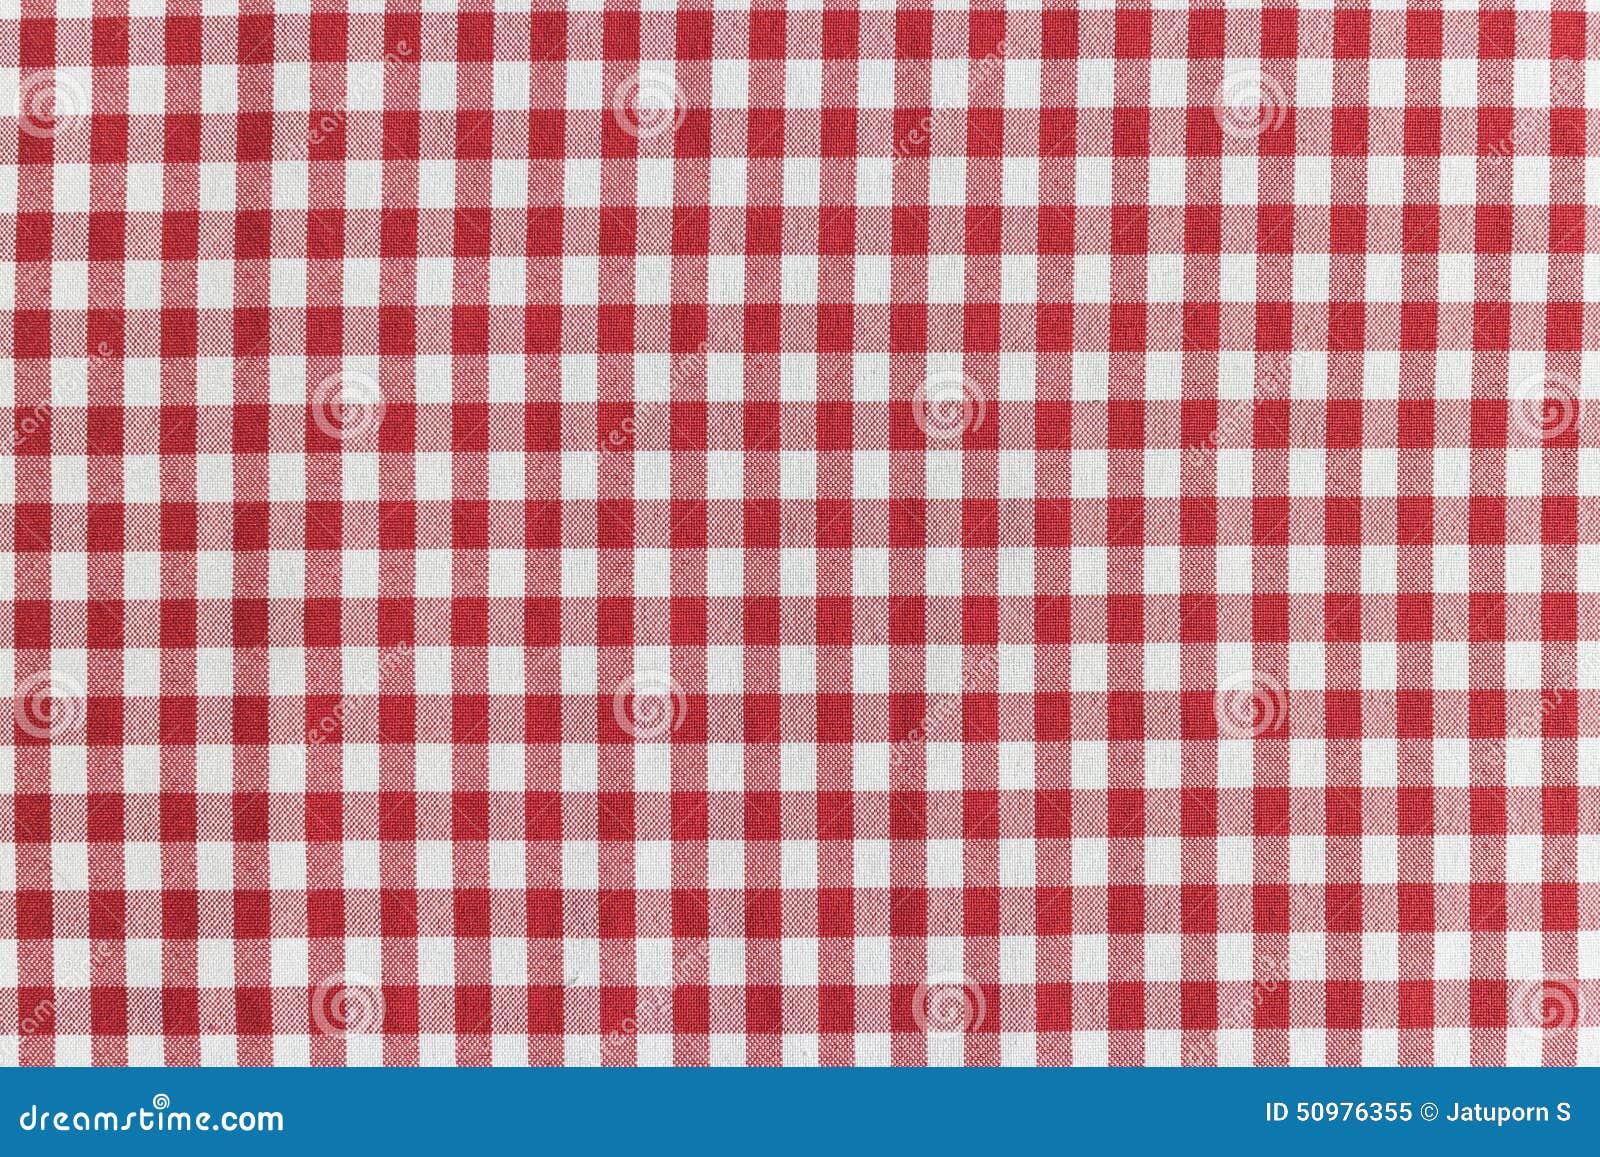 Rood en wit geruit tafelkleed stock afbeelding afbeelding 50976355 - Keuken in rood en wit ...